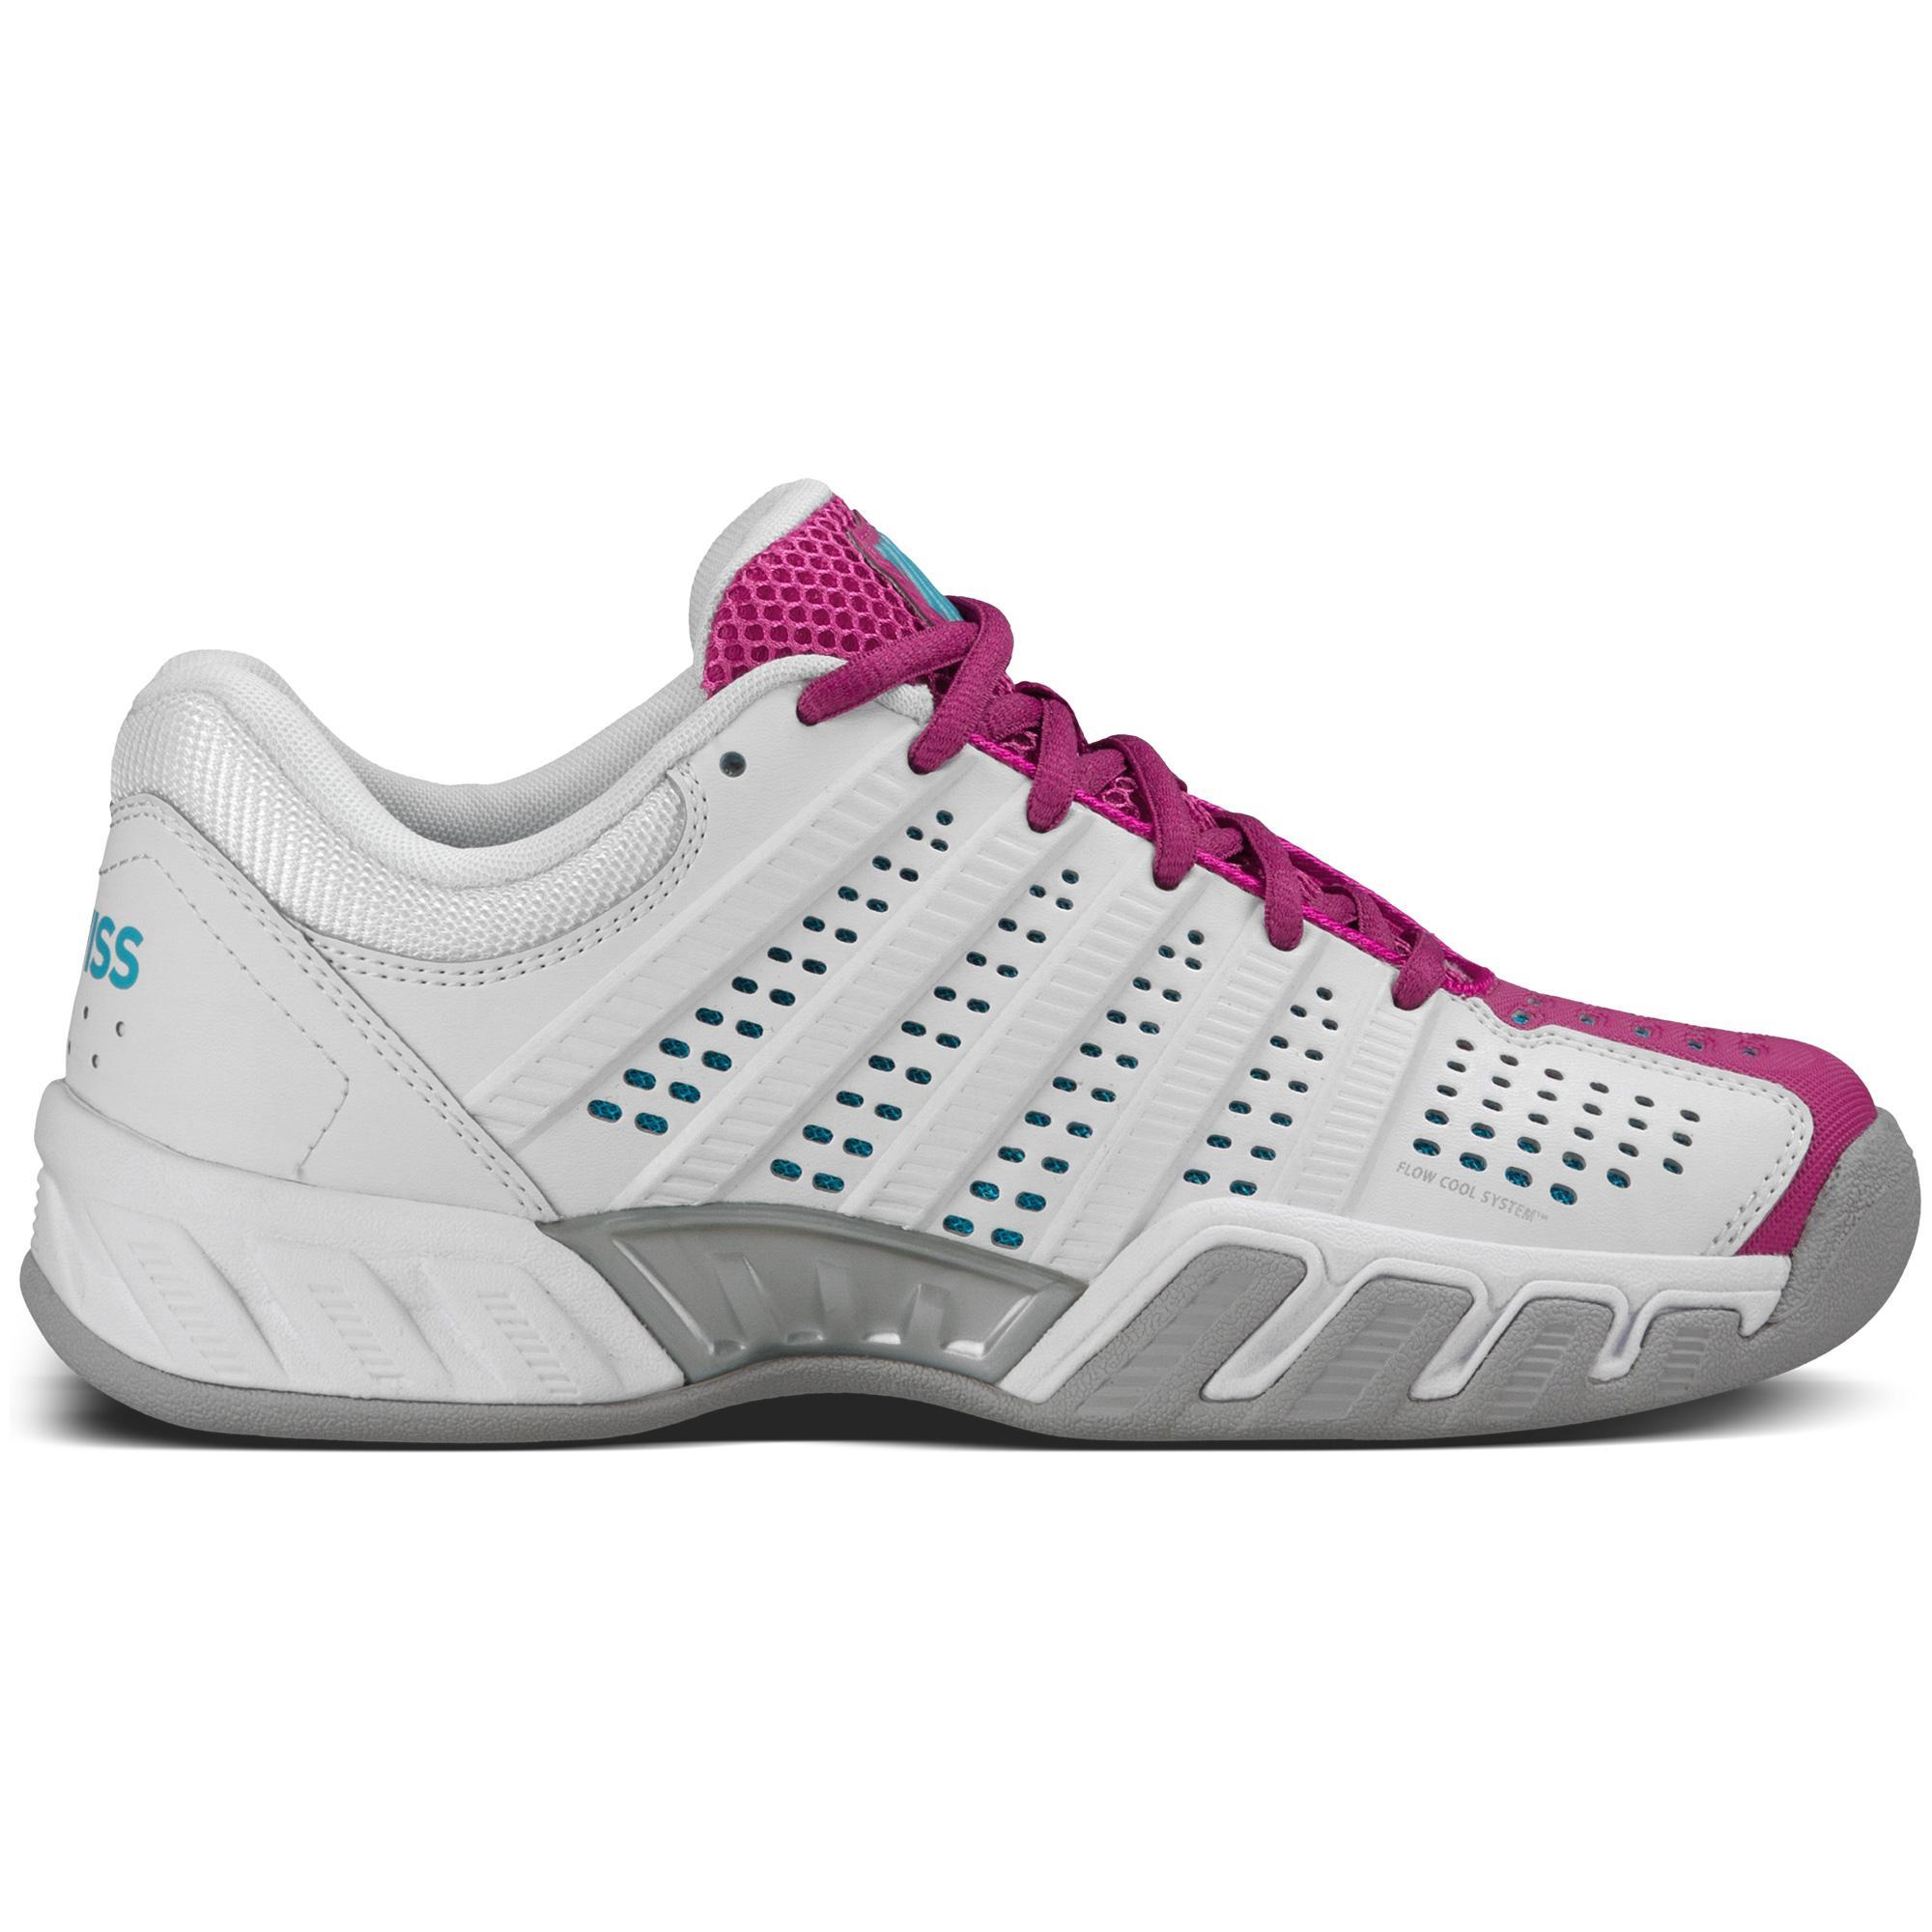 9e13aa33499 K-Swiss Womens BigShot Light 2.5 Indoor Carpet Tennis Shoes - White/Berry